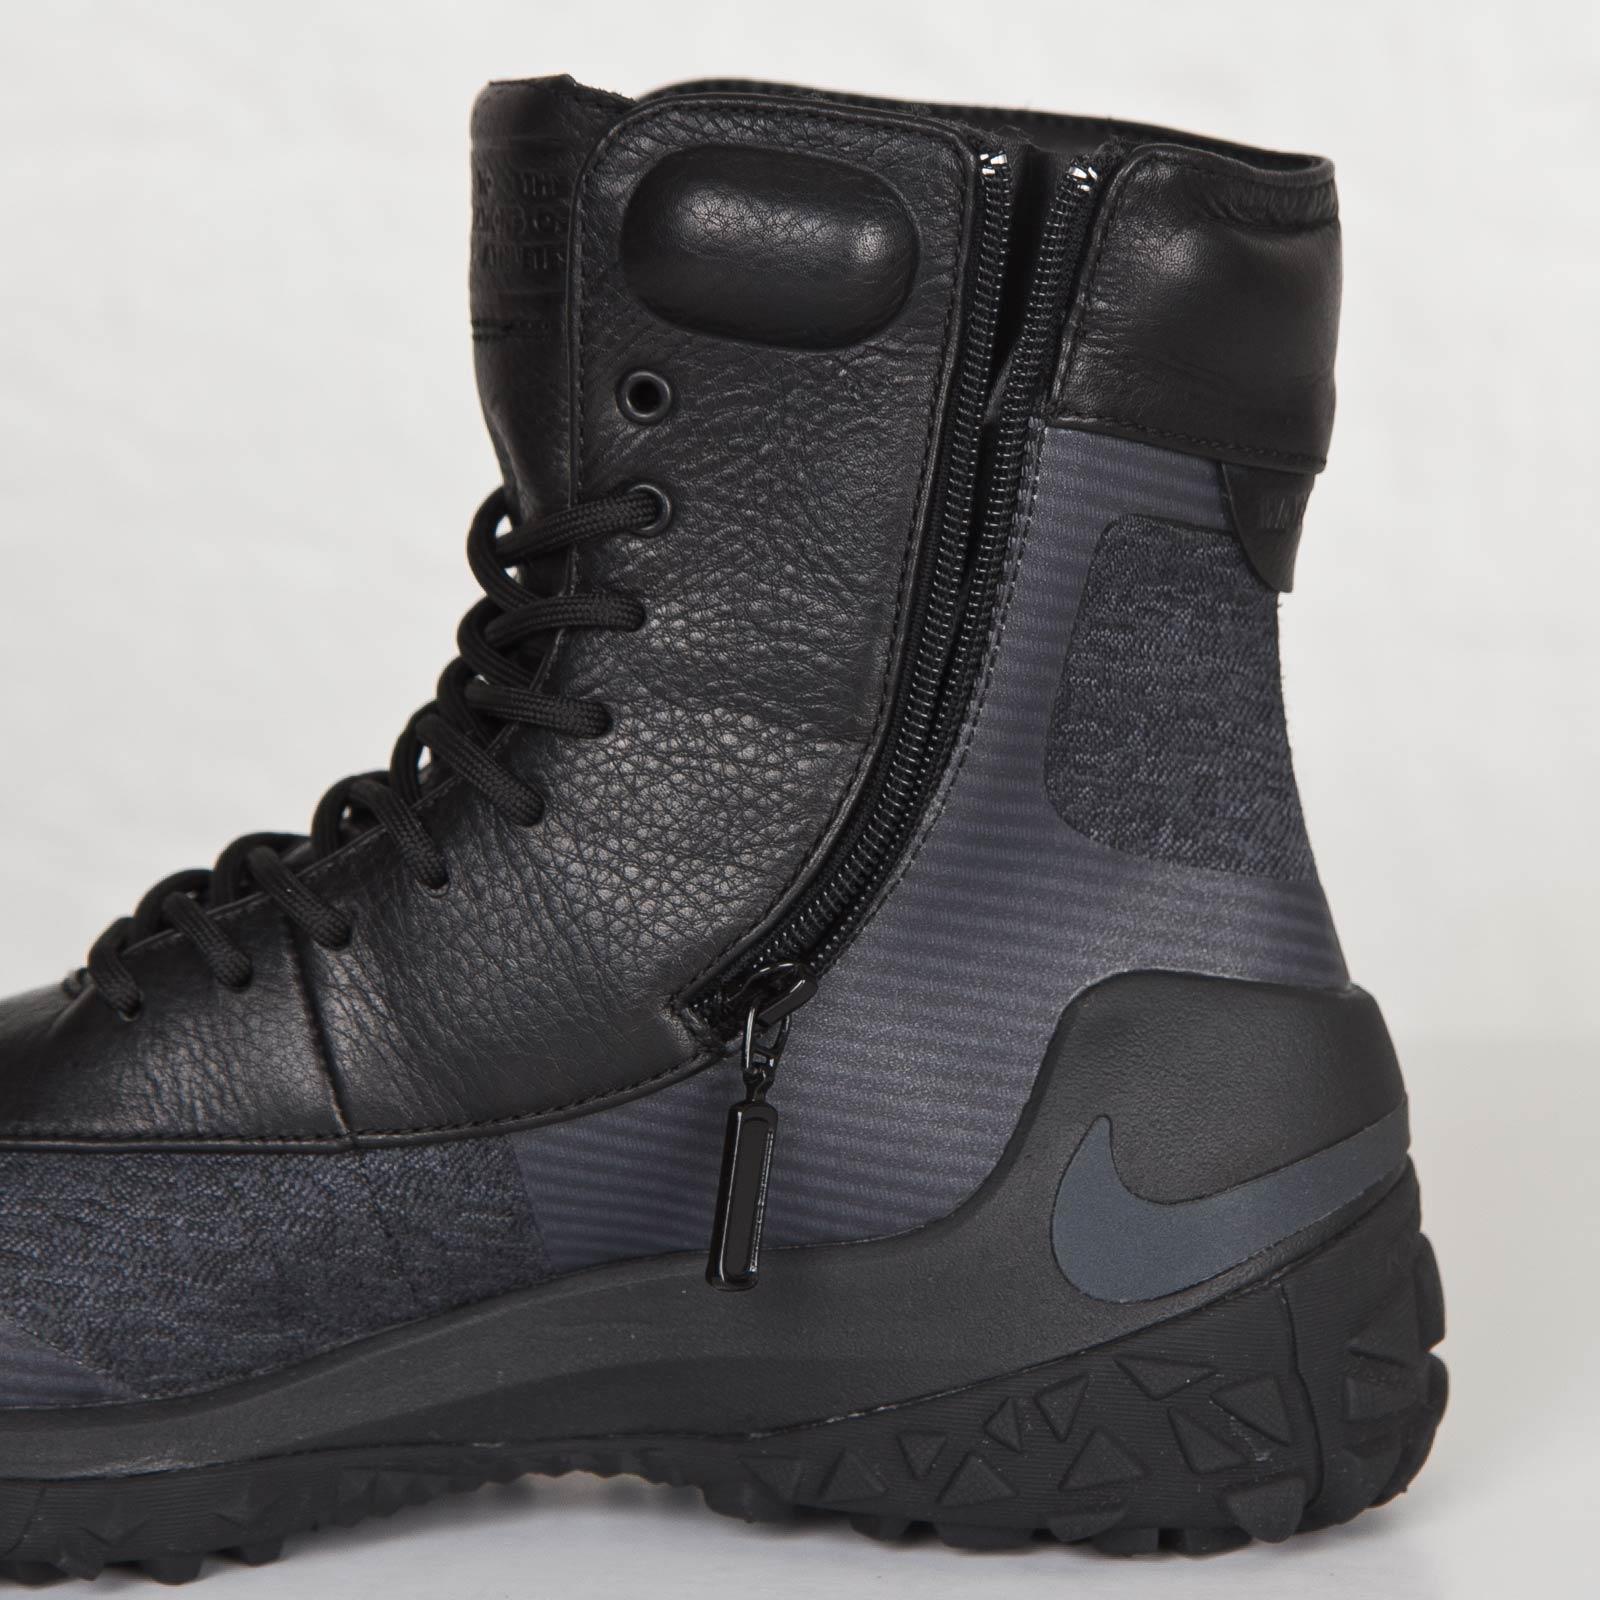 Nike Zoom Kynsi Jacquard WP - 806973